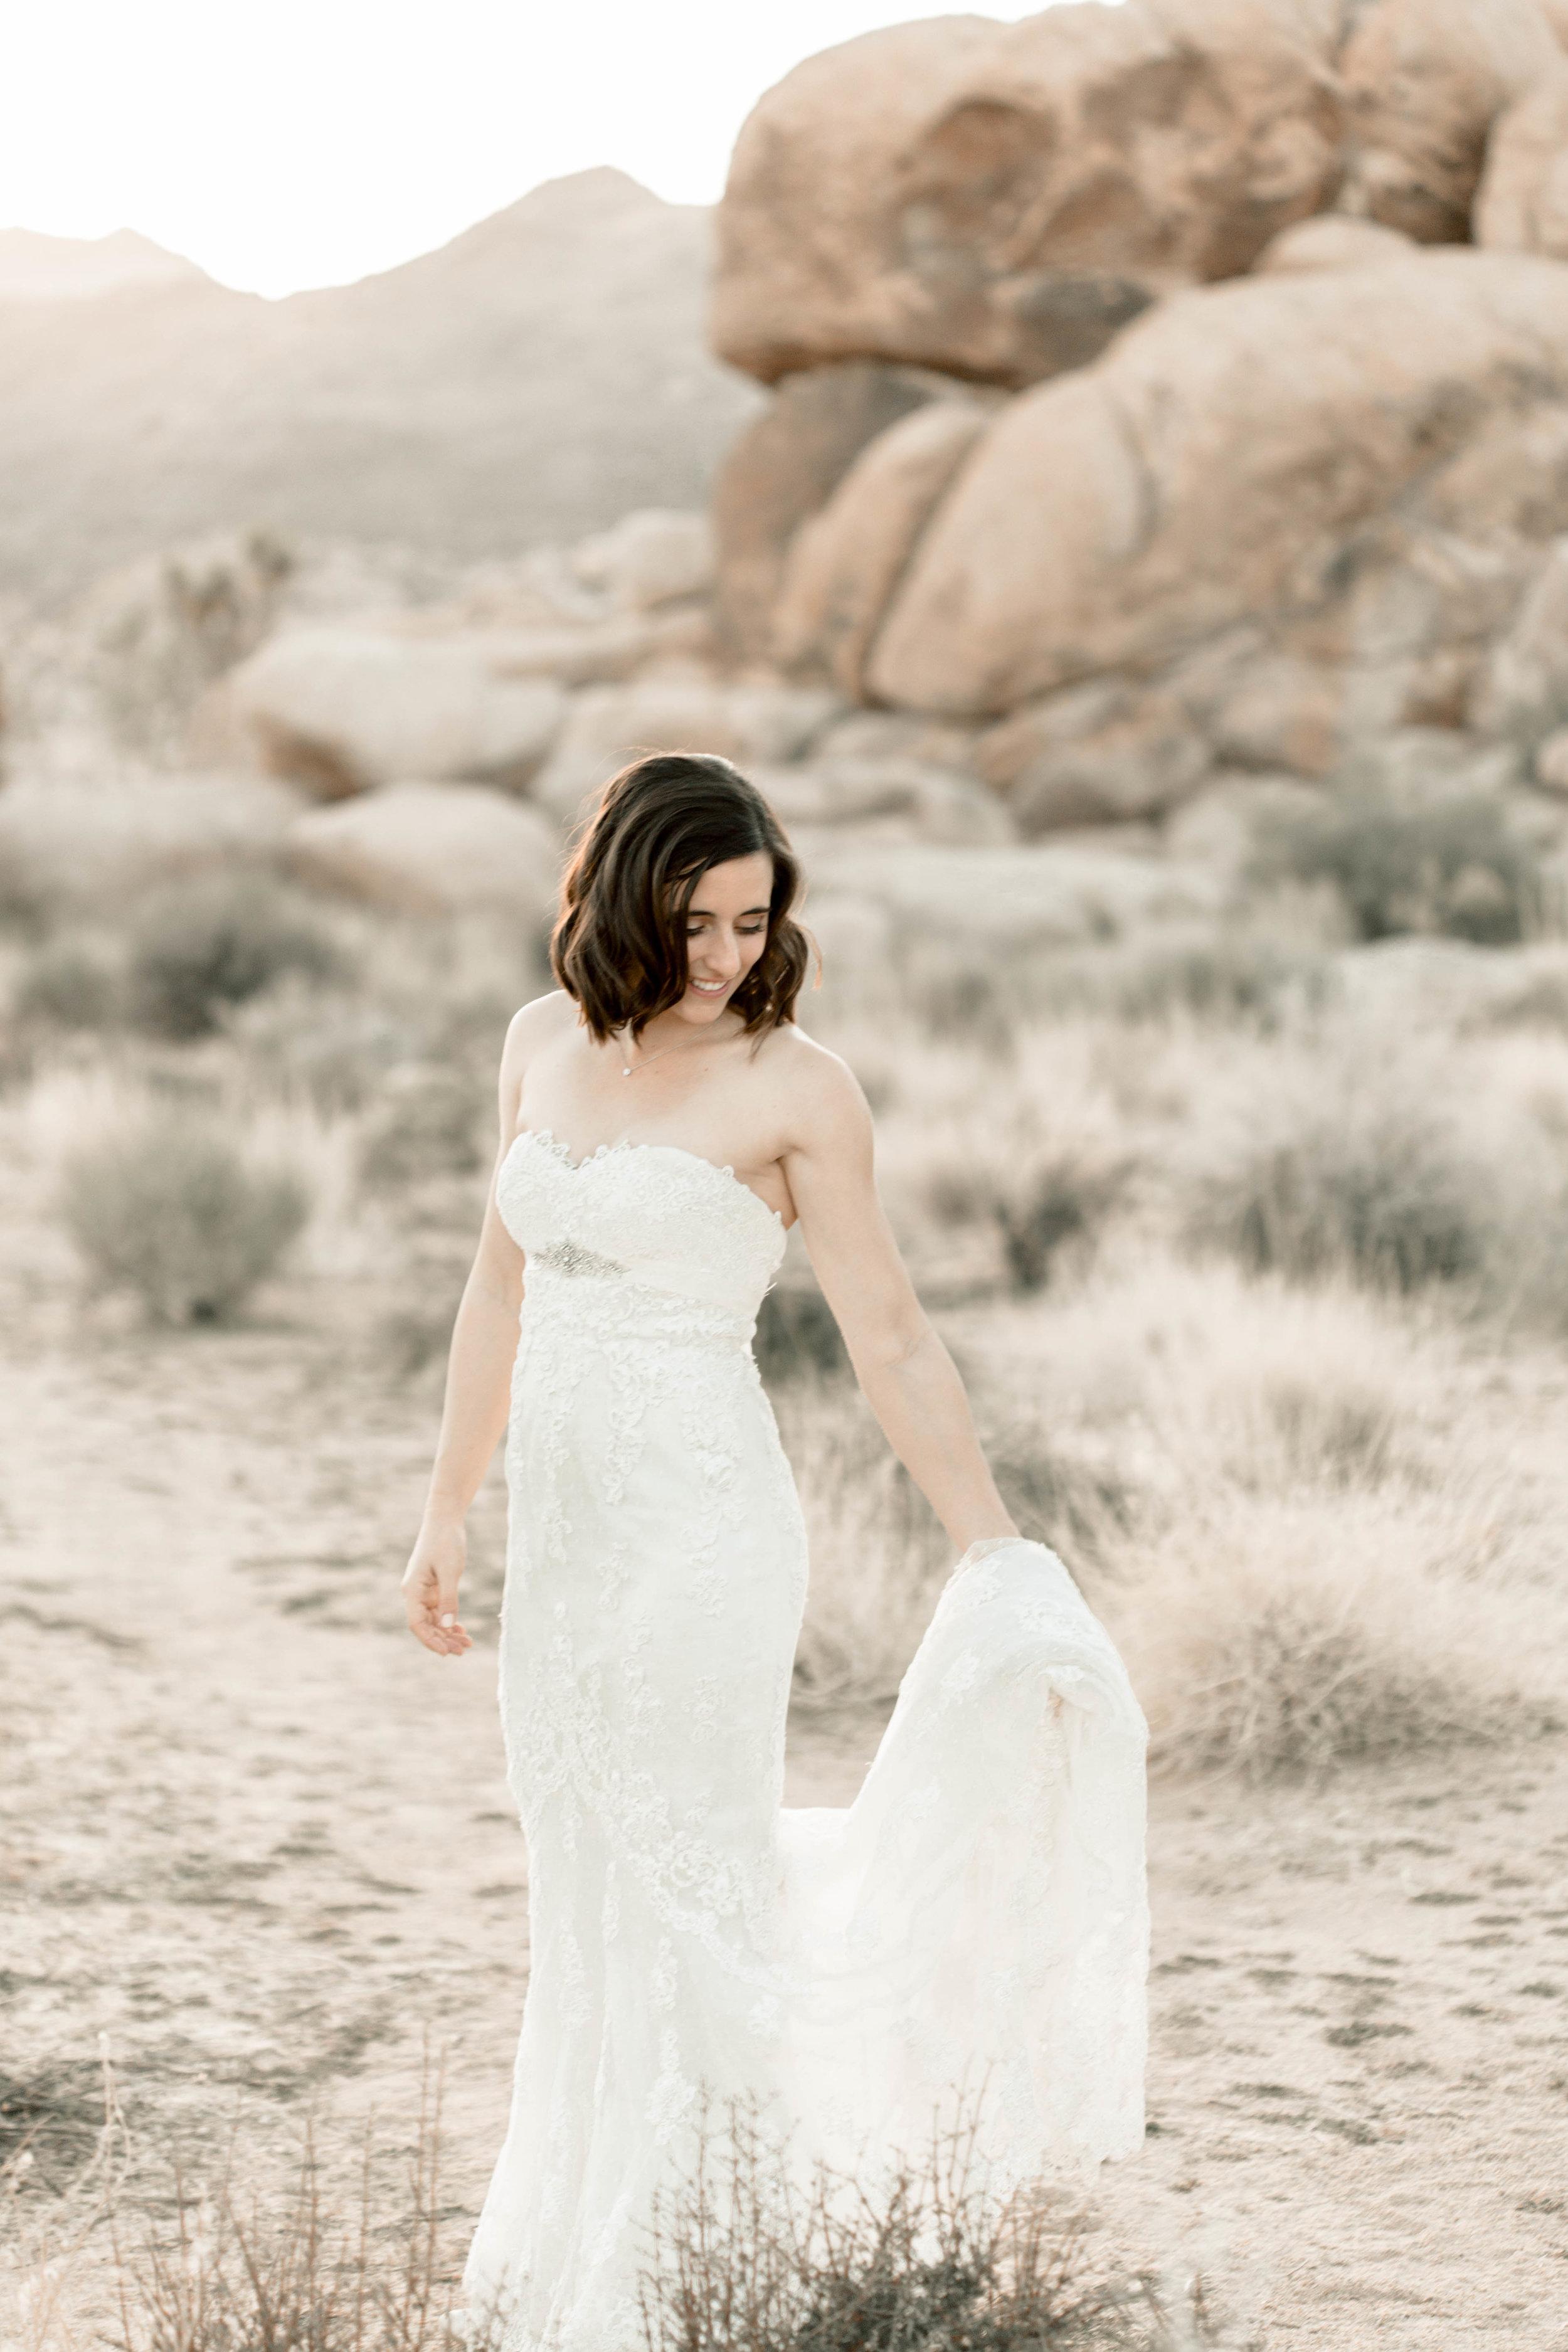 nicole-daacke-photography-joshua-tree-adventurous-elopement-wedding-national-park-wedding-photographer-adventure-wedding-adventurous-elopement-jtree-joshua-tree-national-park-wedding-photographer-intimate-weddings-golden-desert-love-28.jpg